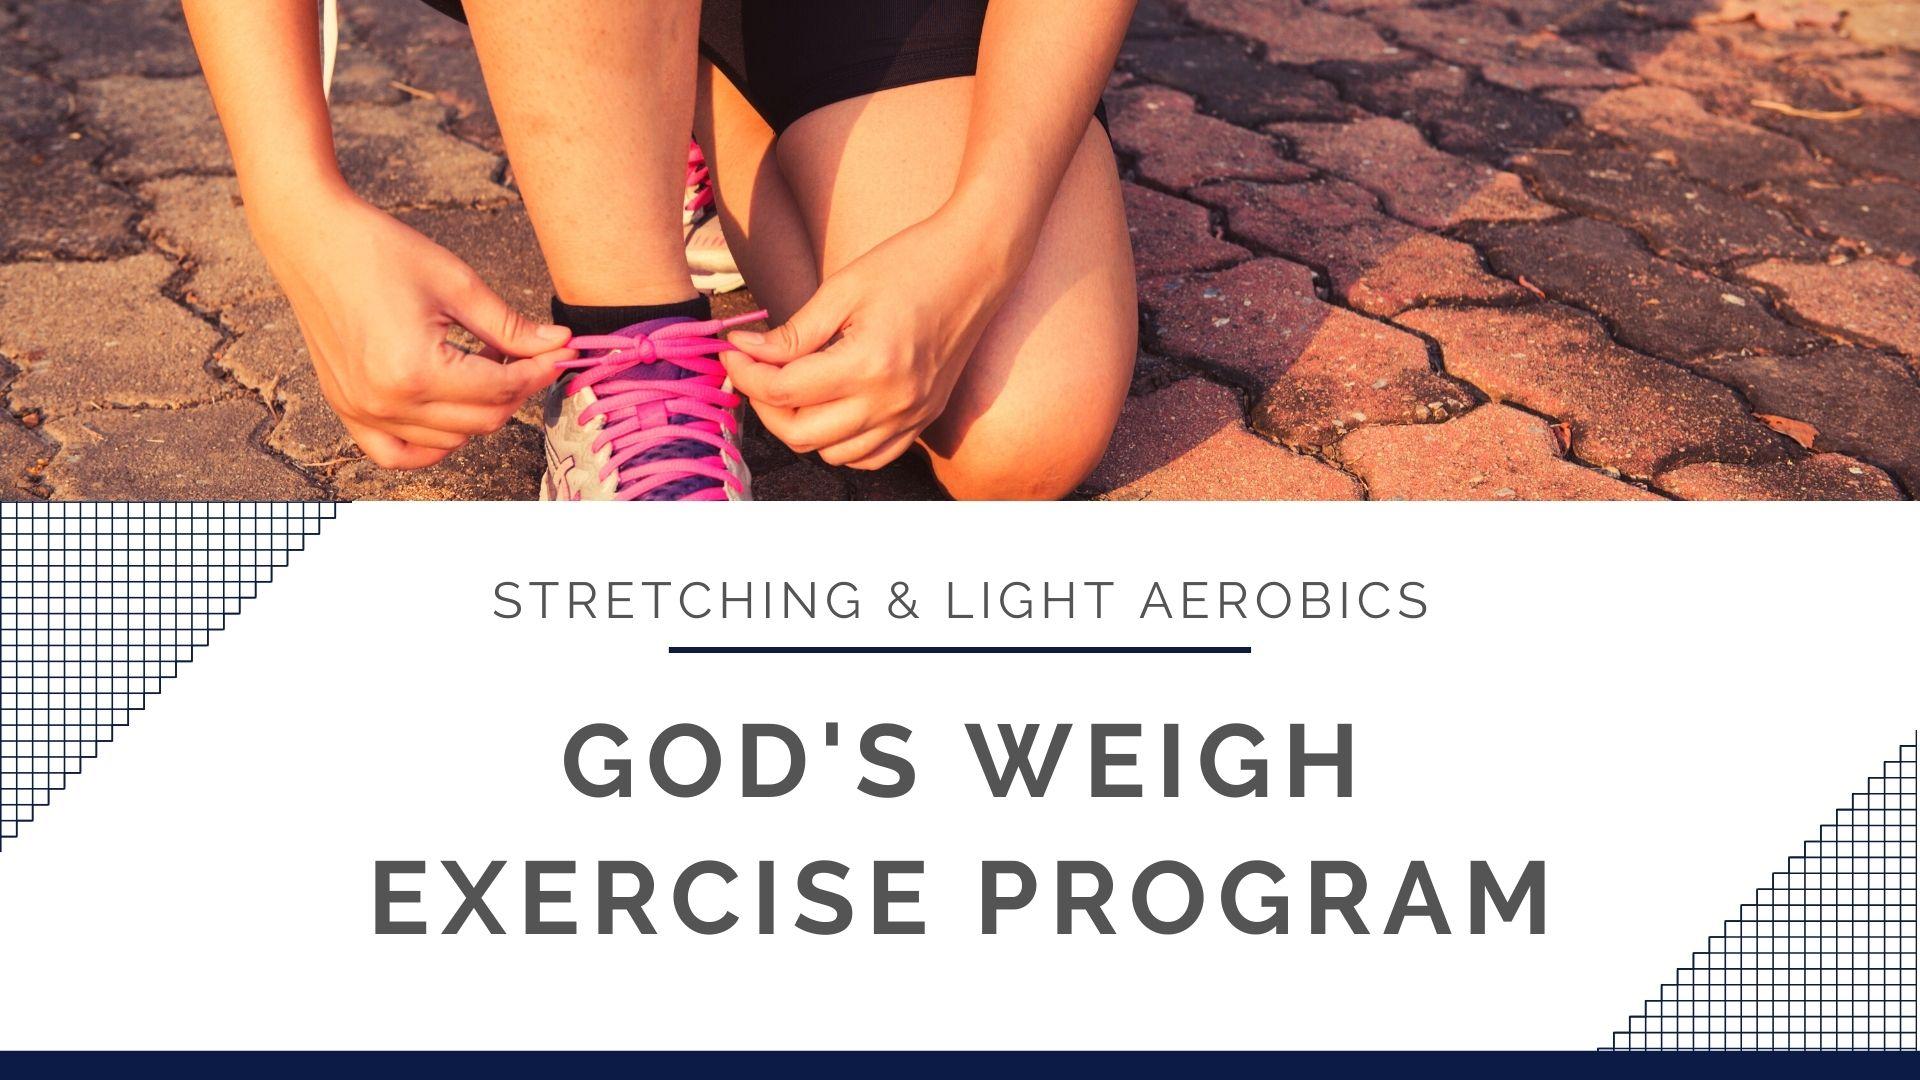 God Weigh Exercise Program